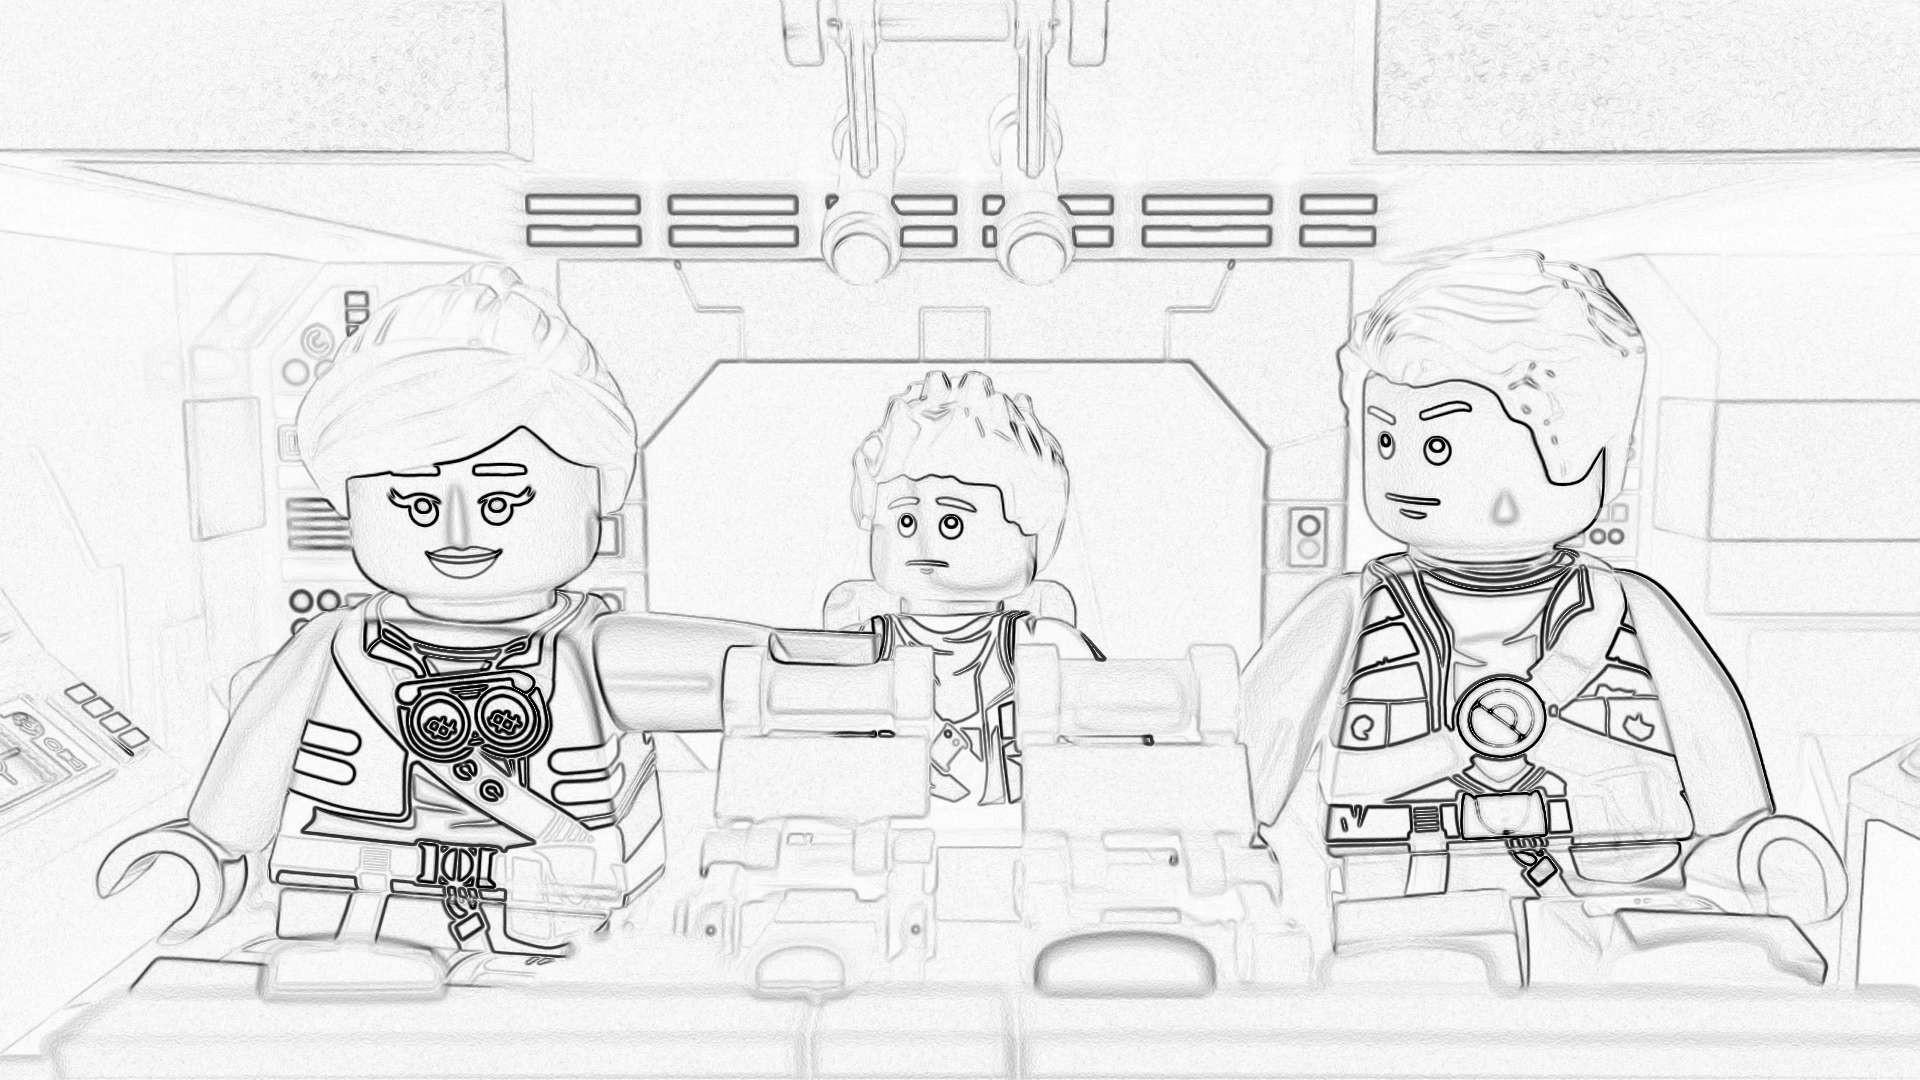 Ausmalbilder Star Wars Lego Neu Lego Starwars Coloring Pages Christmas Coloring Pages Lego Schön Das Bild